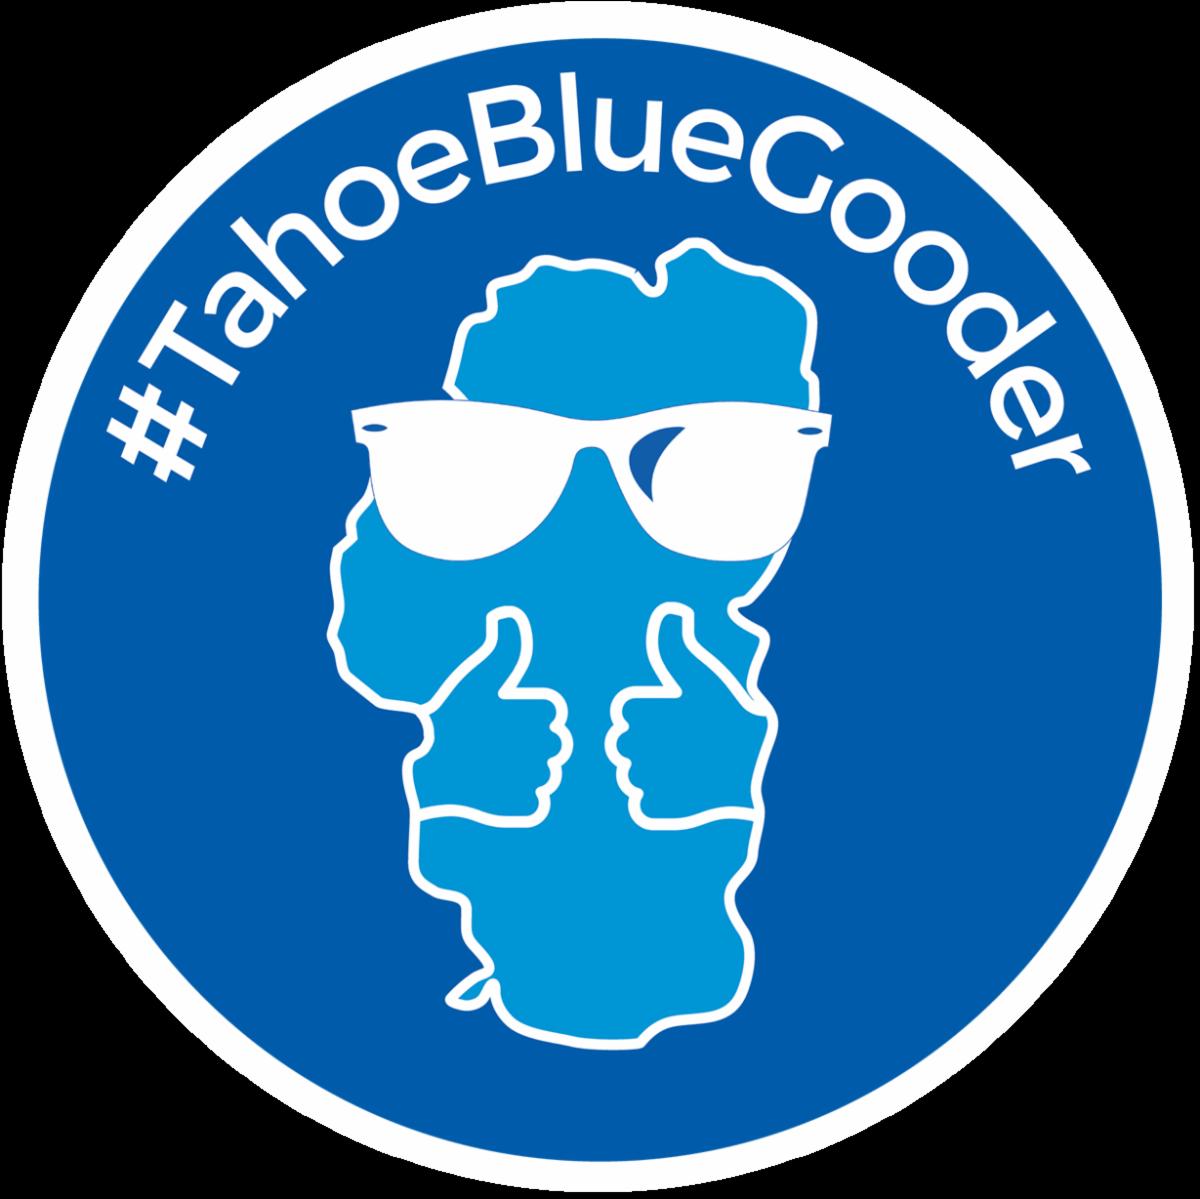 Tahoe Blue-Gooder